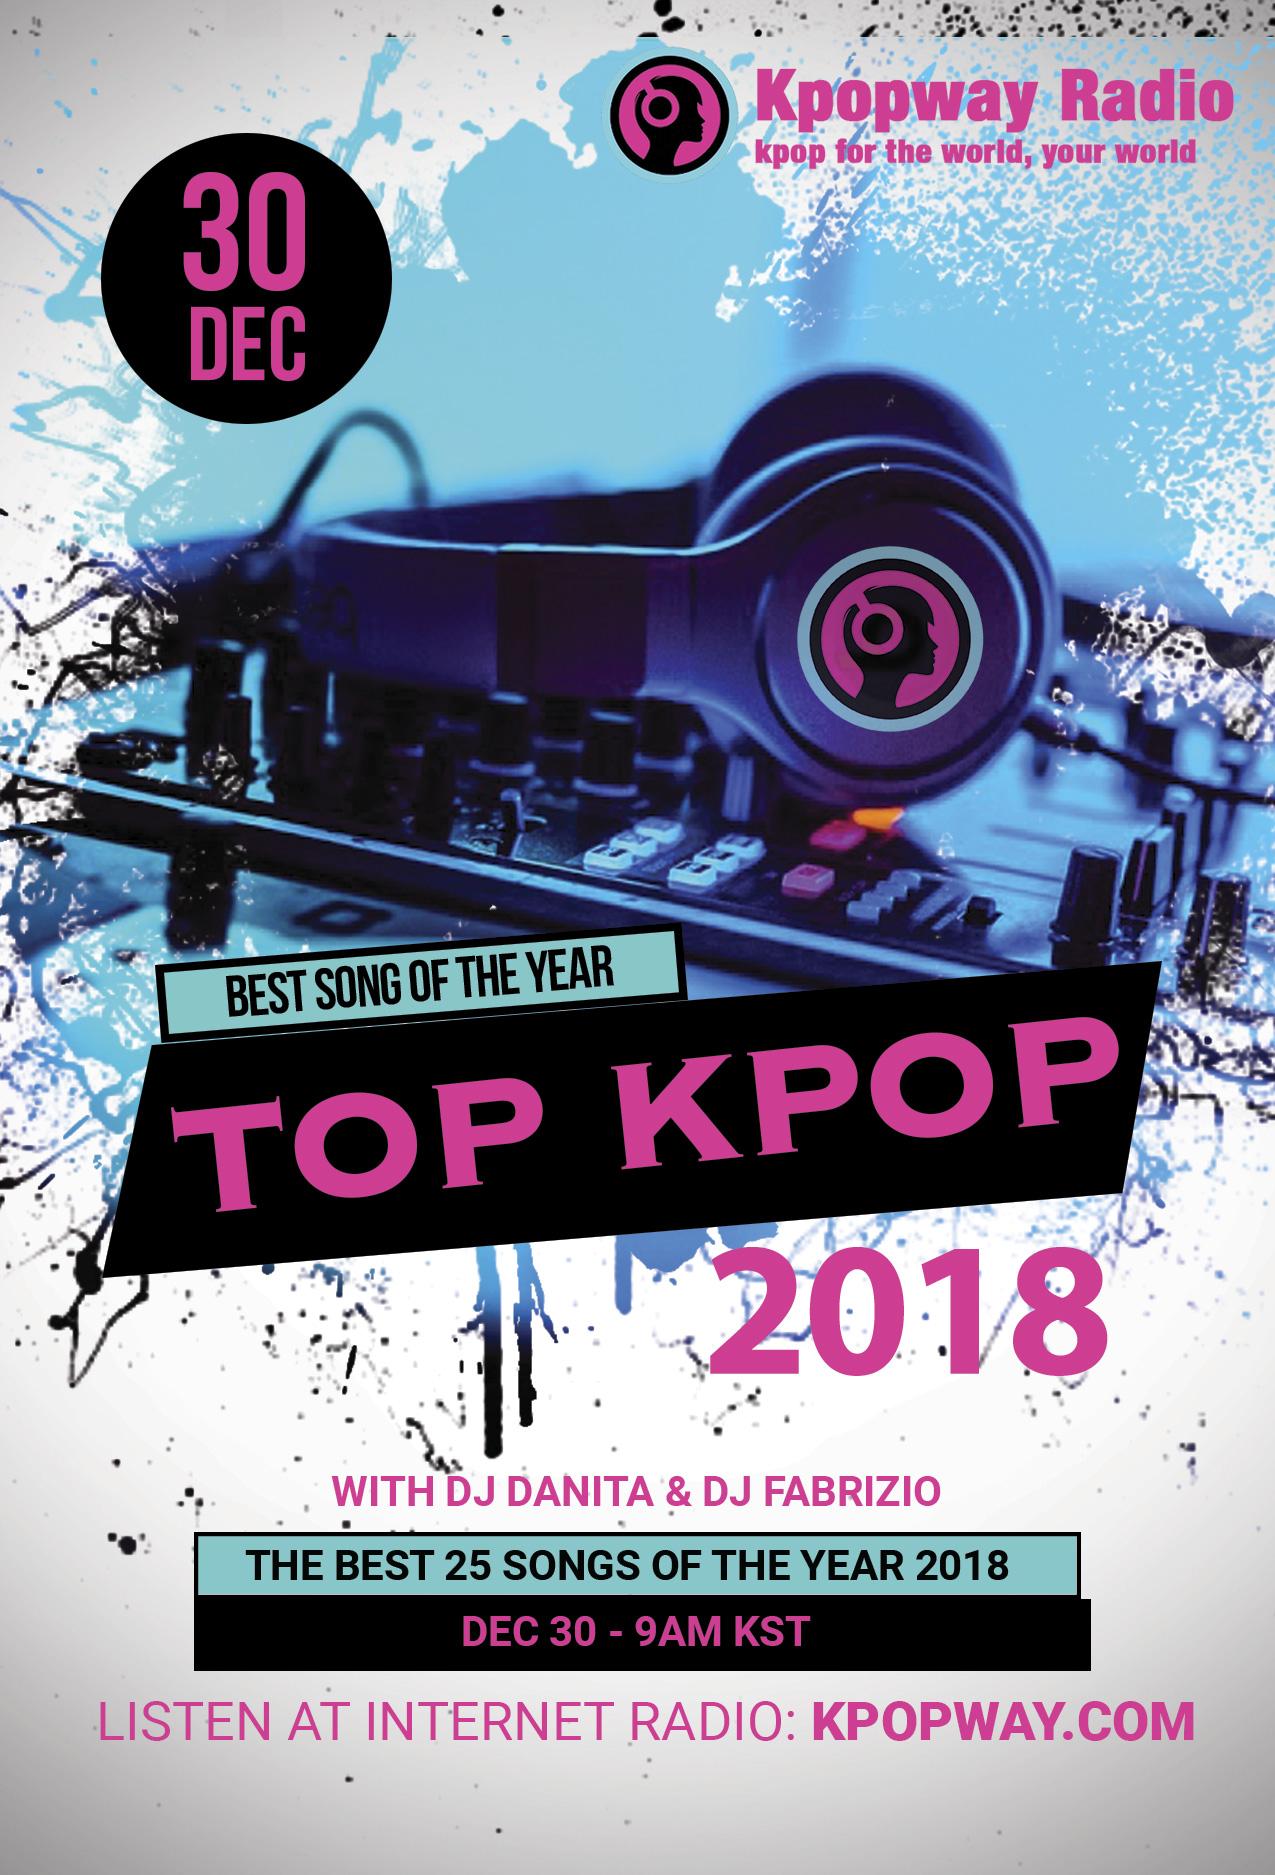 Top Kpop 2018 at Kpopway Radio